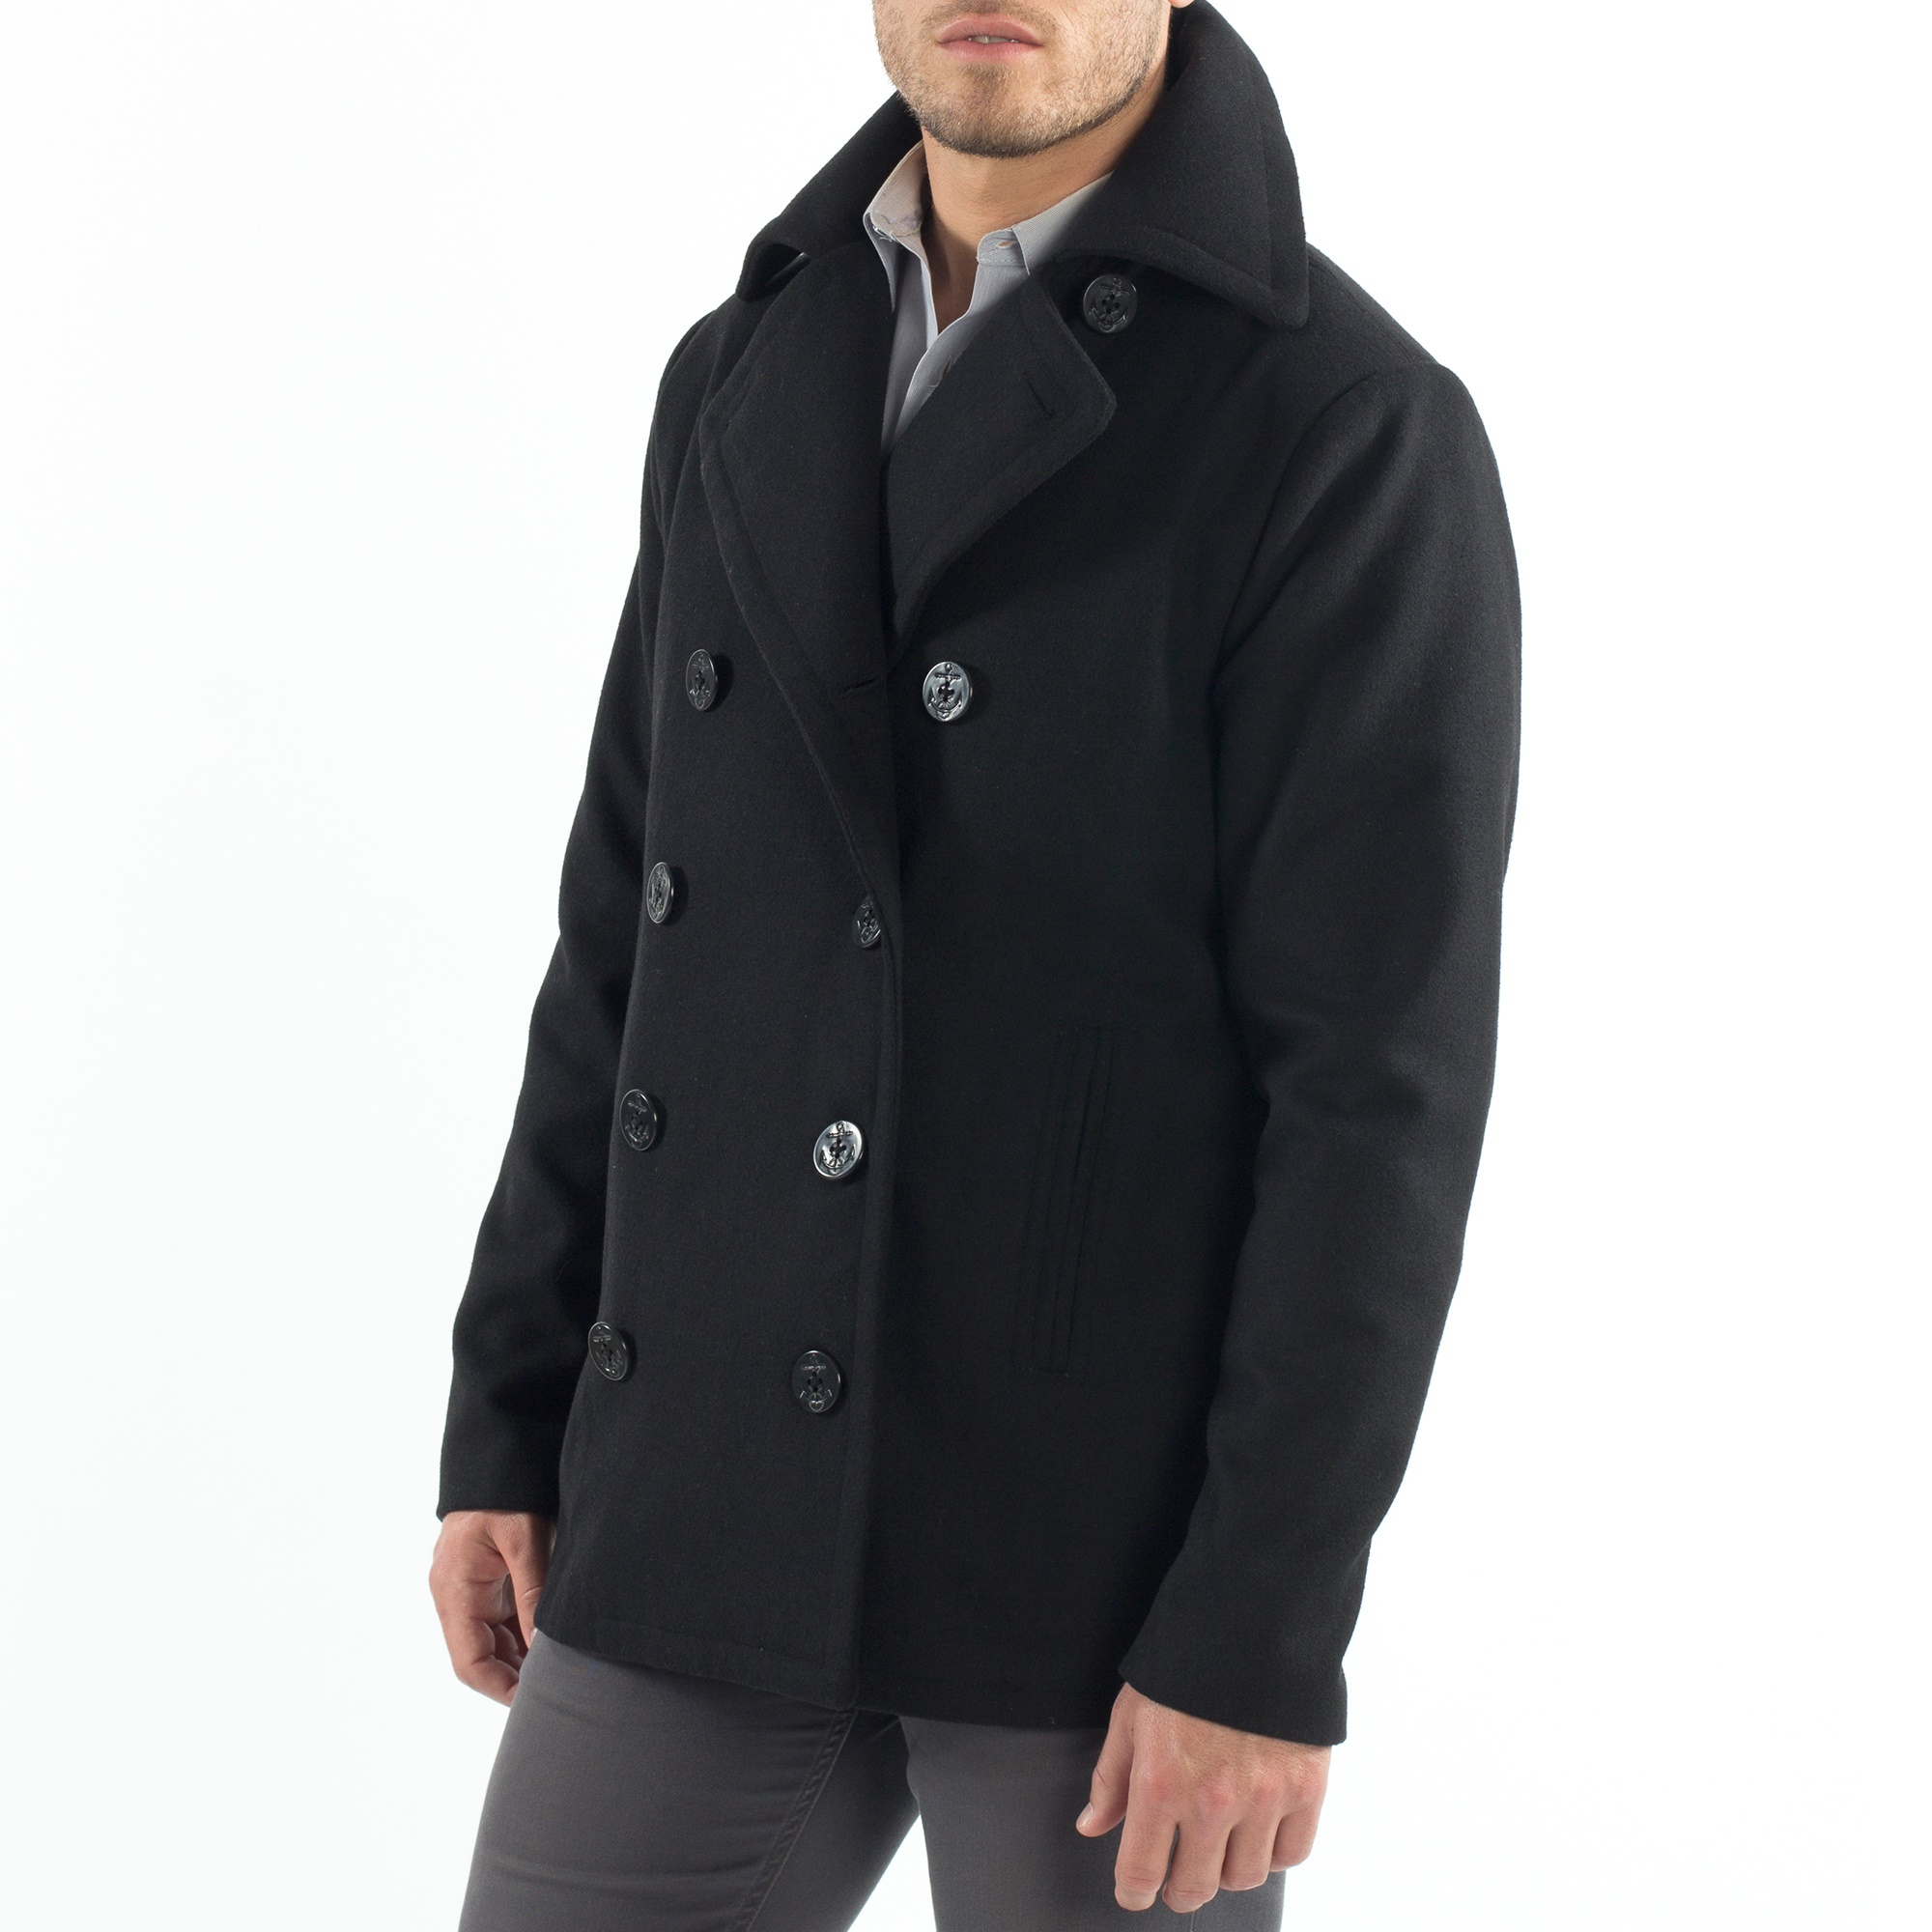 Alpine-Swiss-Mason-Mens-Wool-Blend-Pea-Coat-Jacket-Double-Breasted-Dress-Coat thumbnail 18